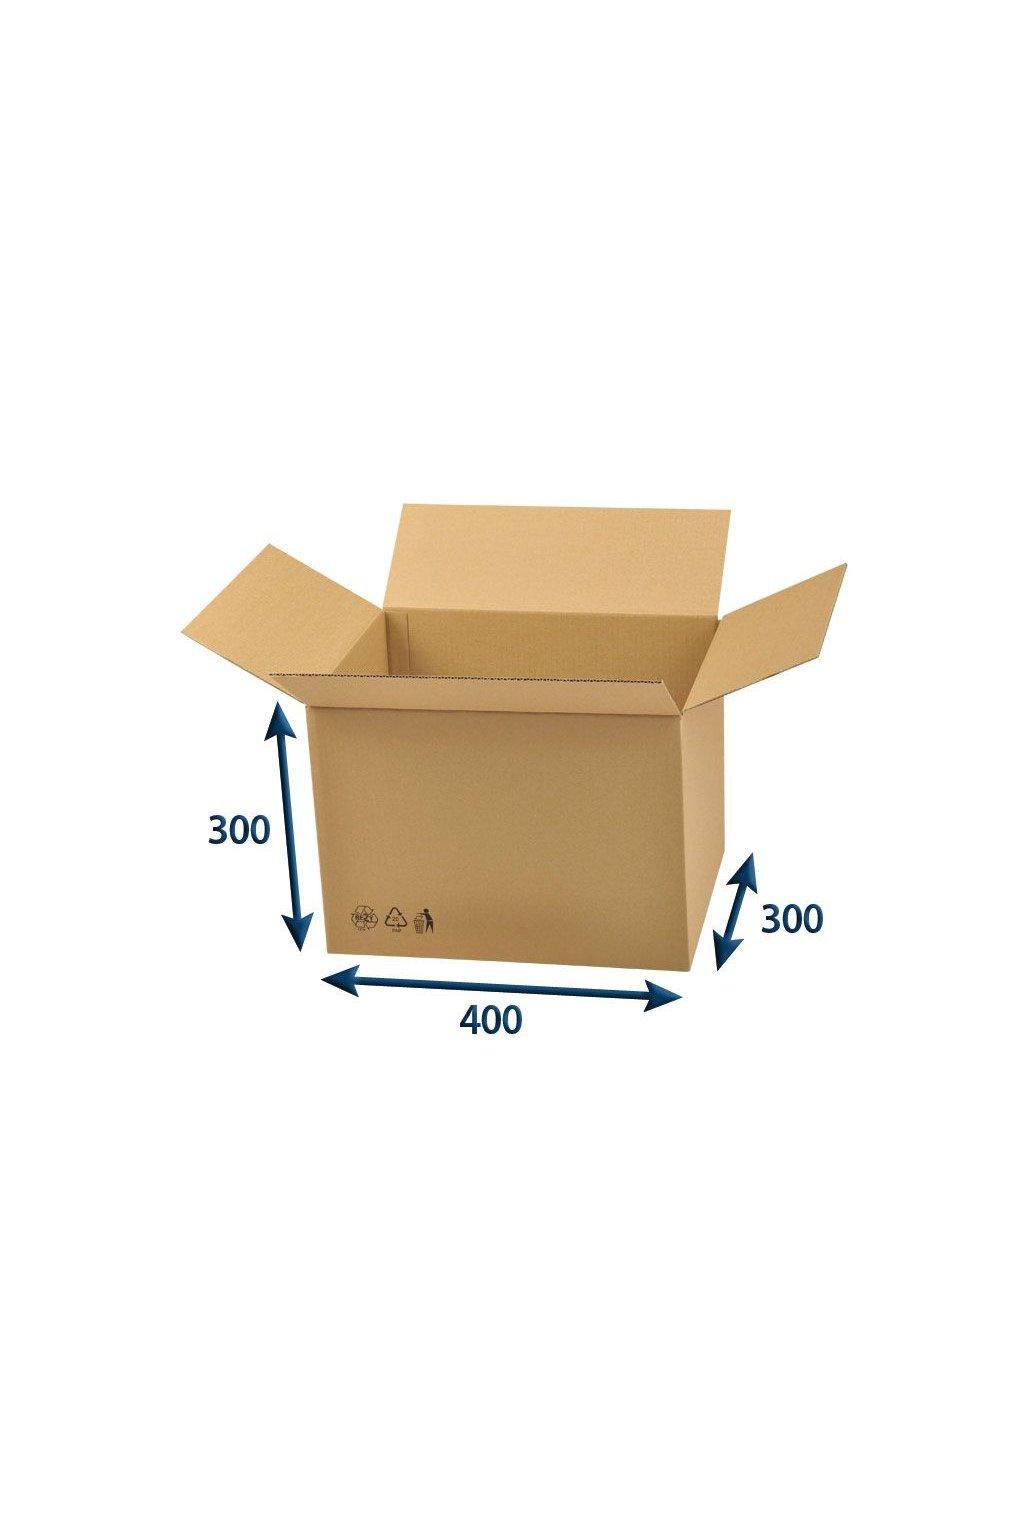 thumb full kartonova krabice 400x300x300 3vvl klopova